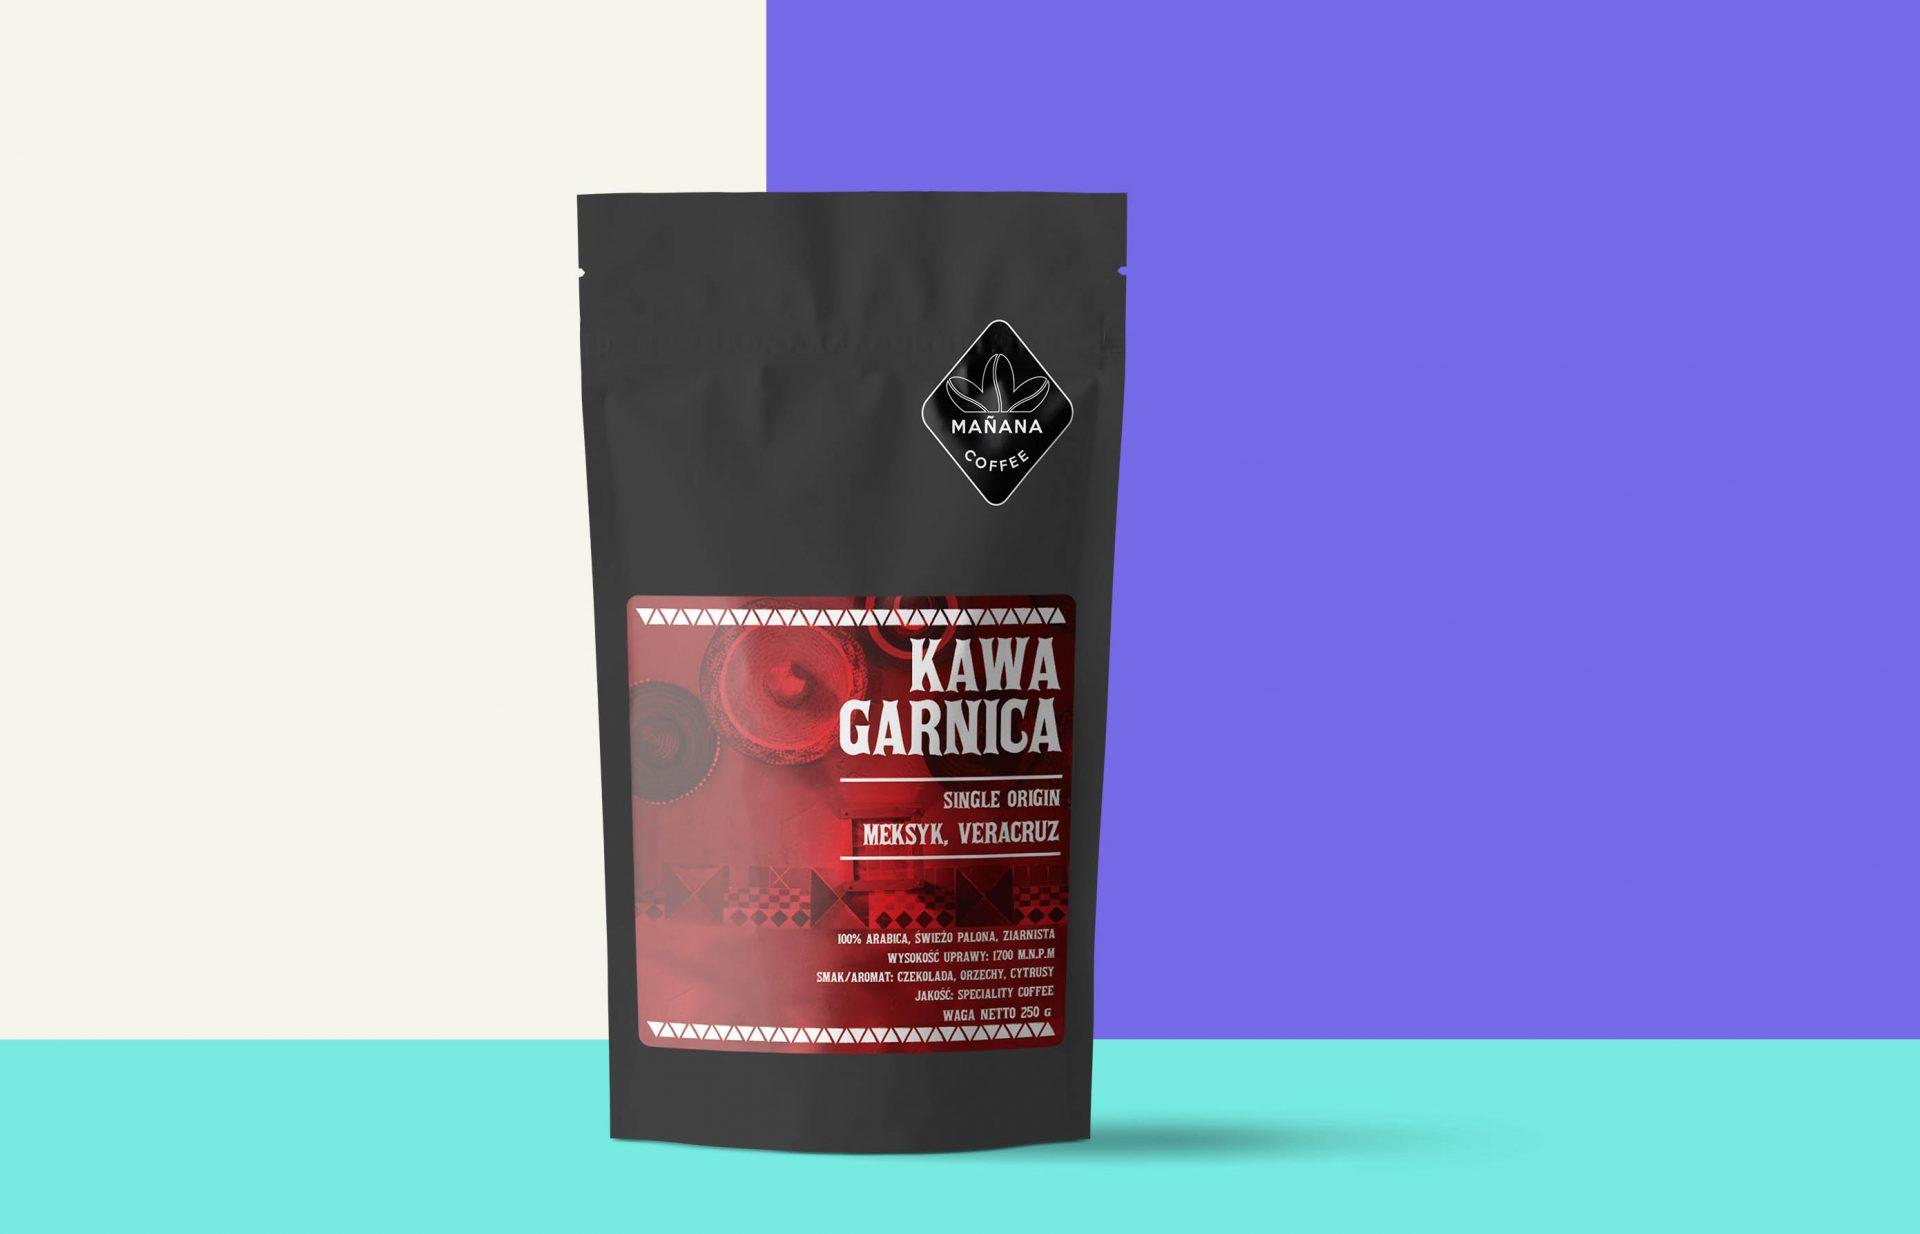 Manana caffee packing